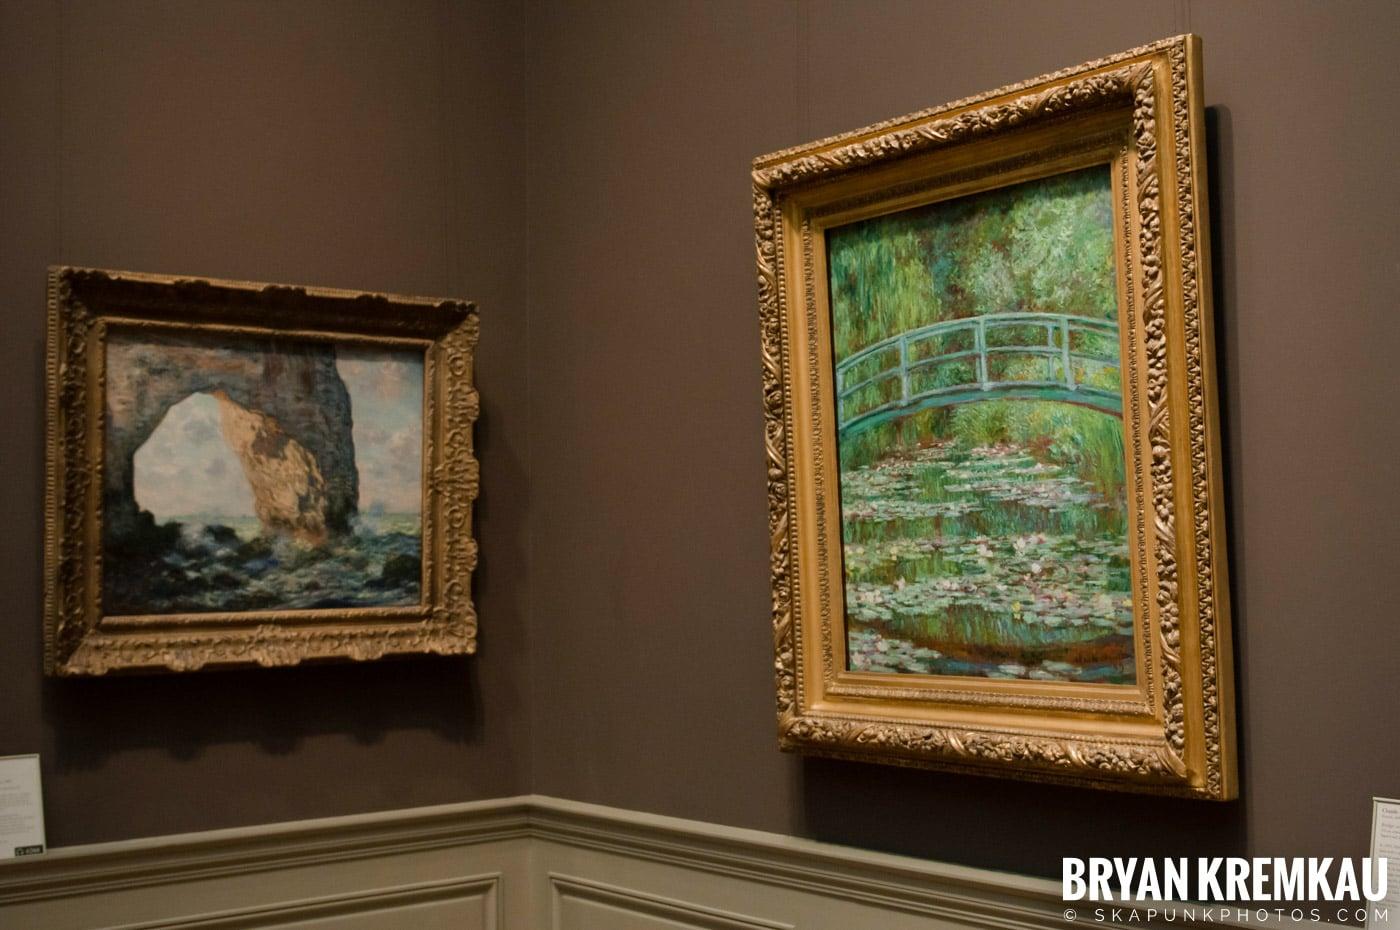 The Metropolitan Museum of Art and Shake Shack @ New York, NY - 3.24.12 (37)